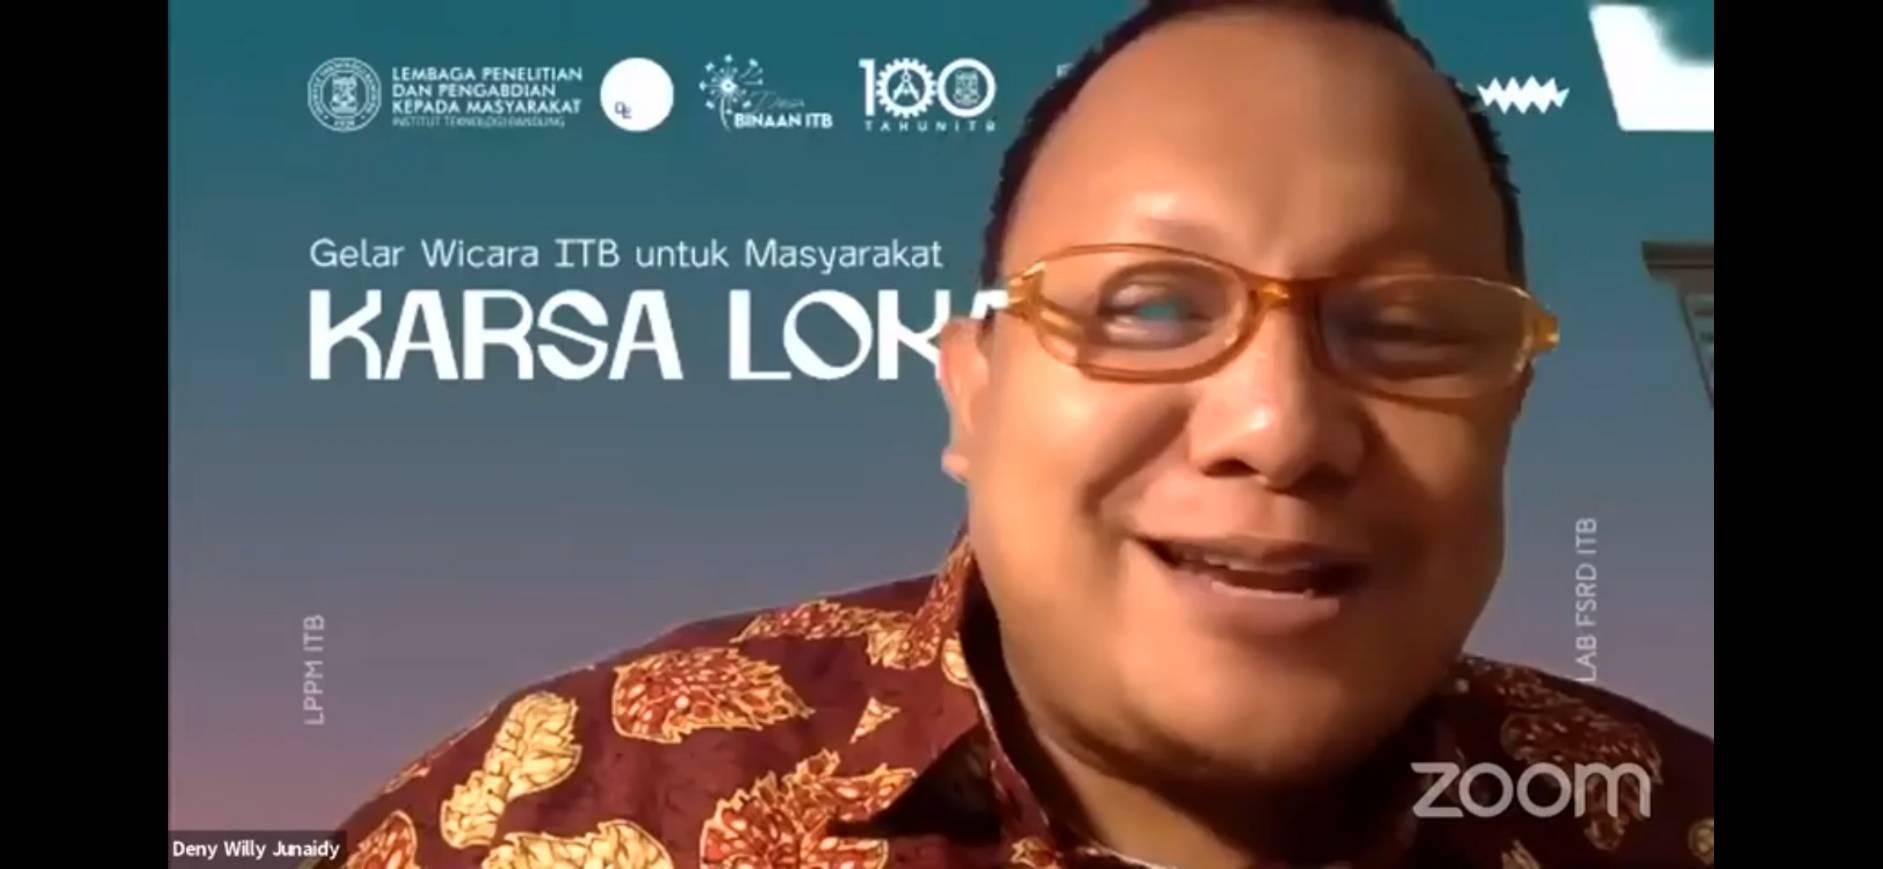 lppm-itb-selenggarakan-webinar-a-story-from-village-karsa-loka